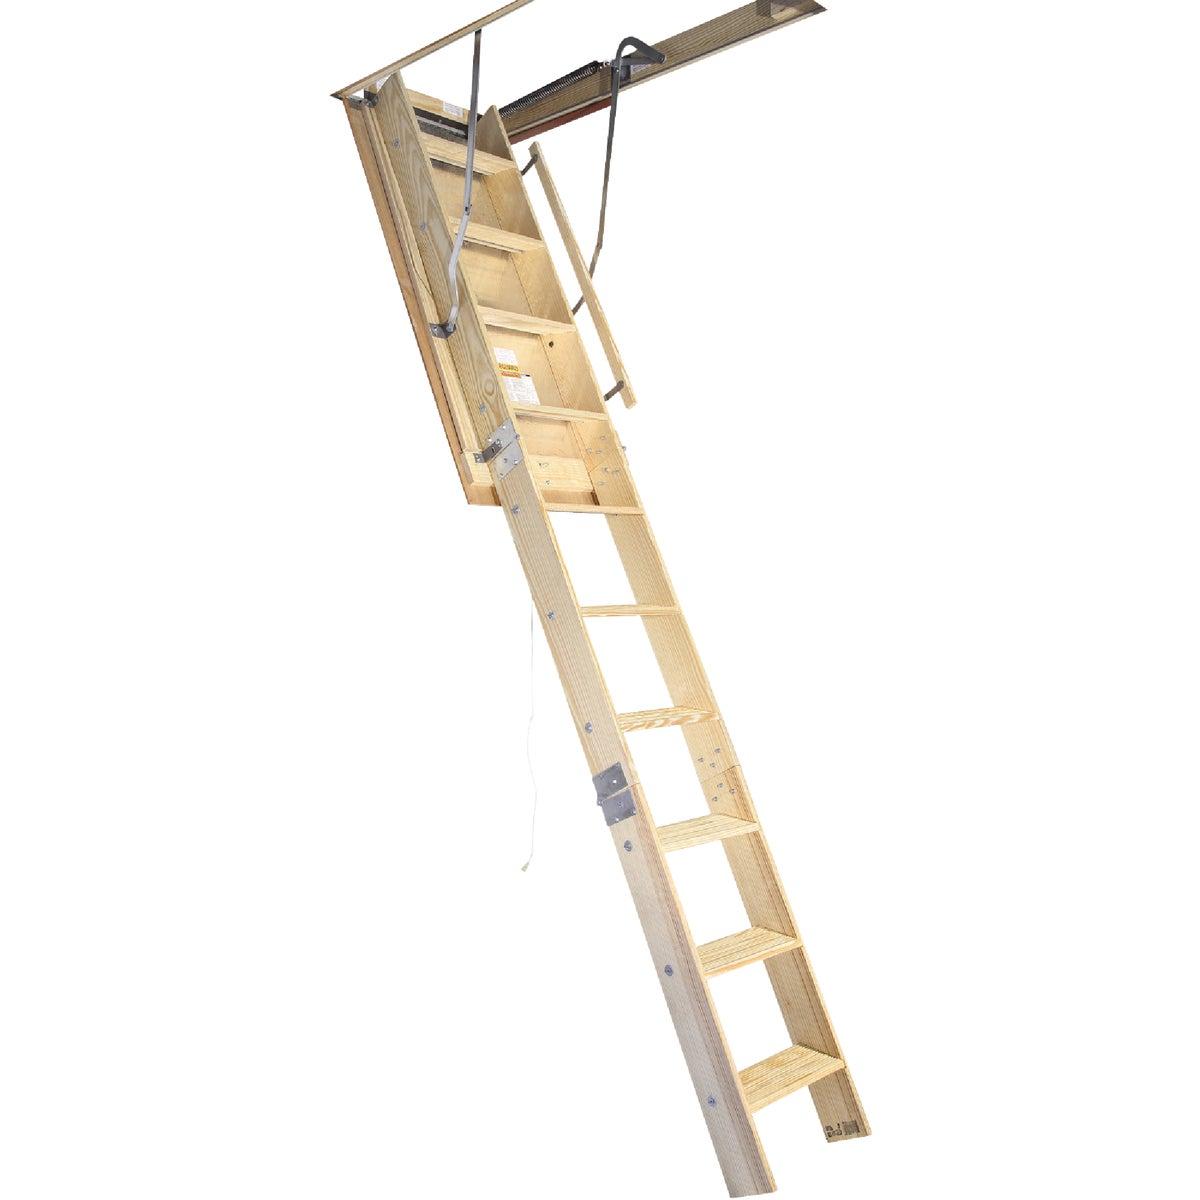 25.5X54X105 F Atic Stair